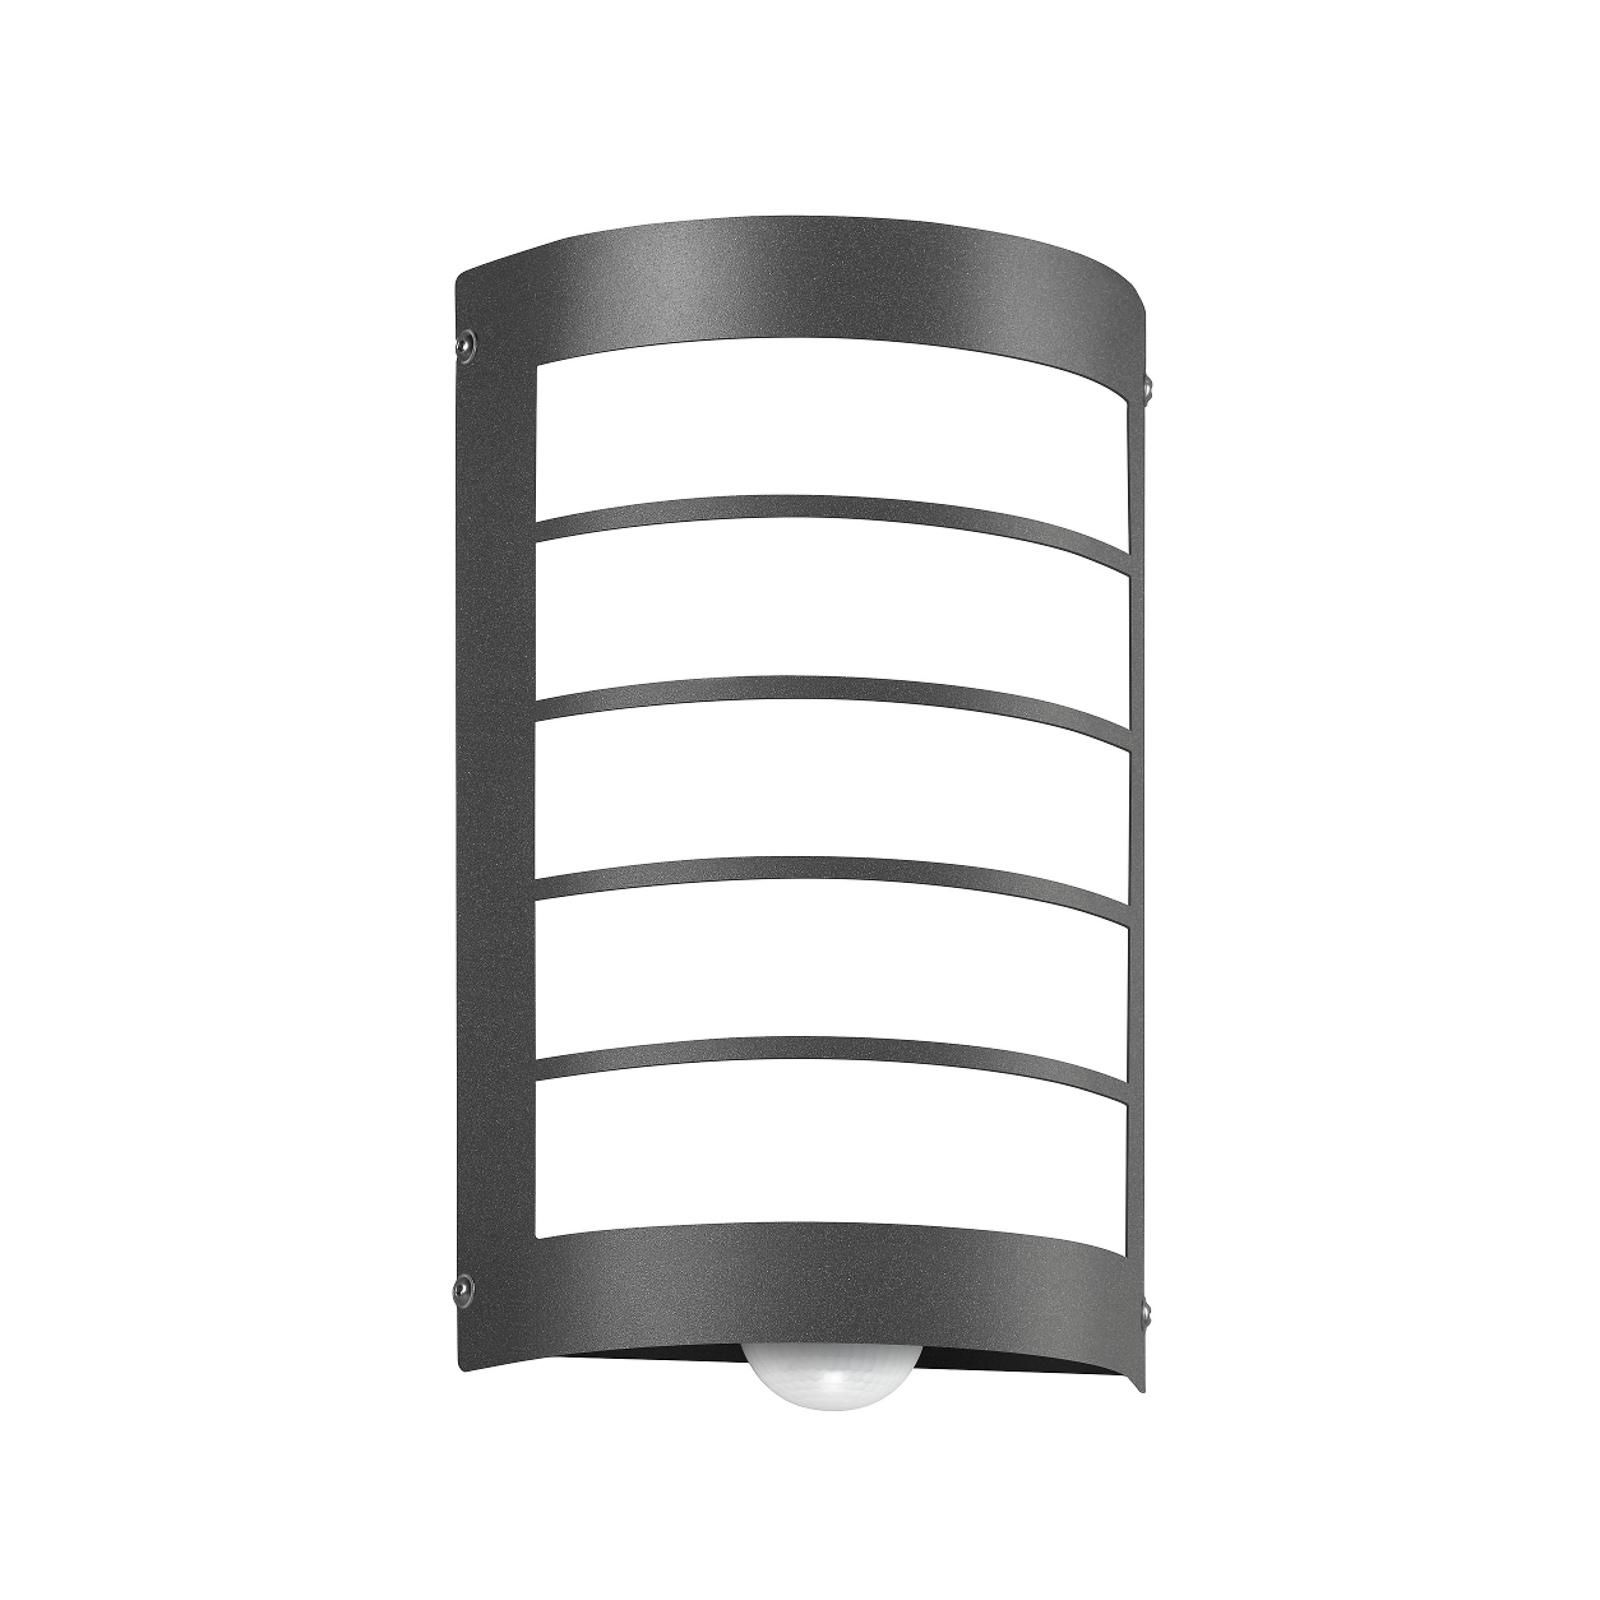 Sensor-Außenlampe Aqua Marco mit Raster, anthrazit